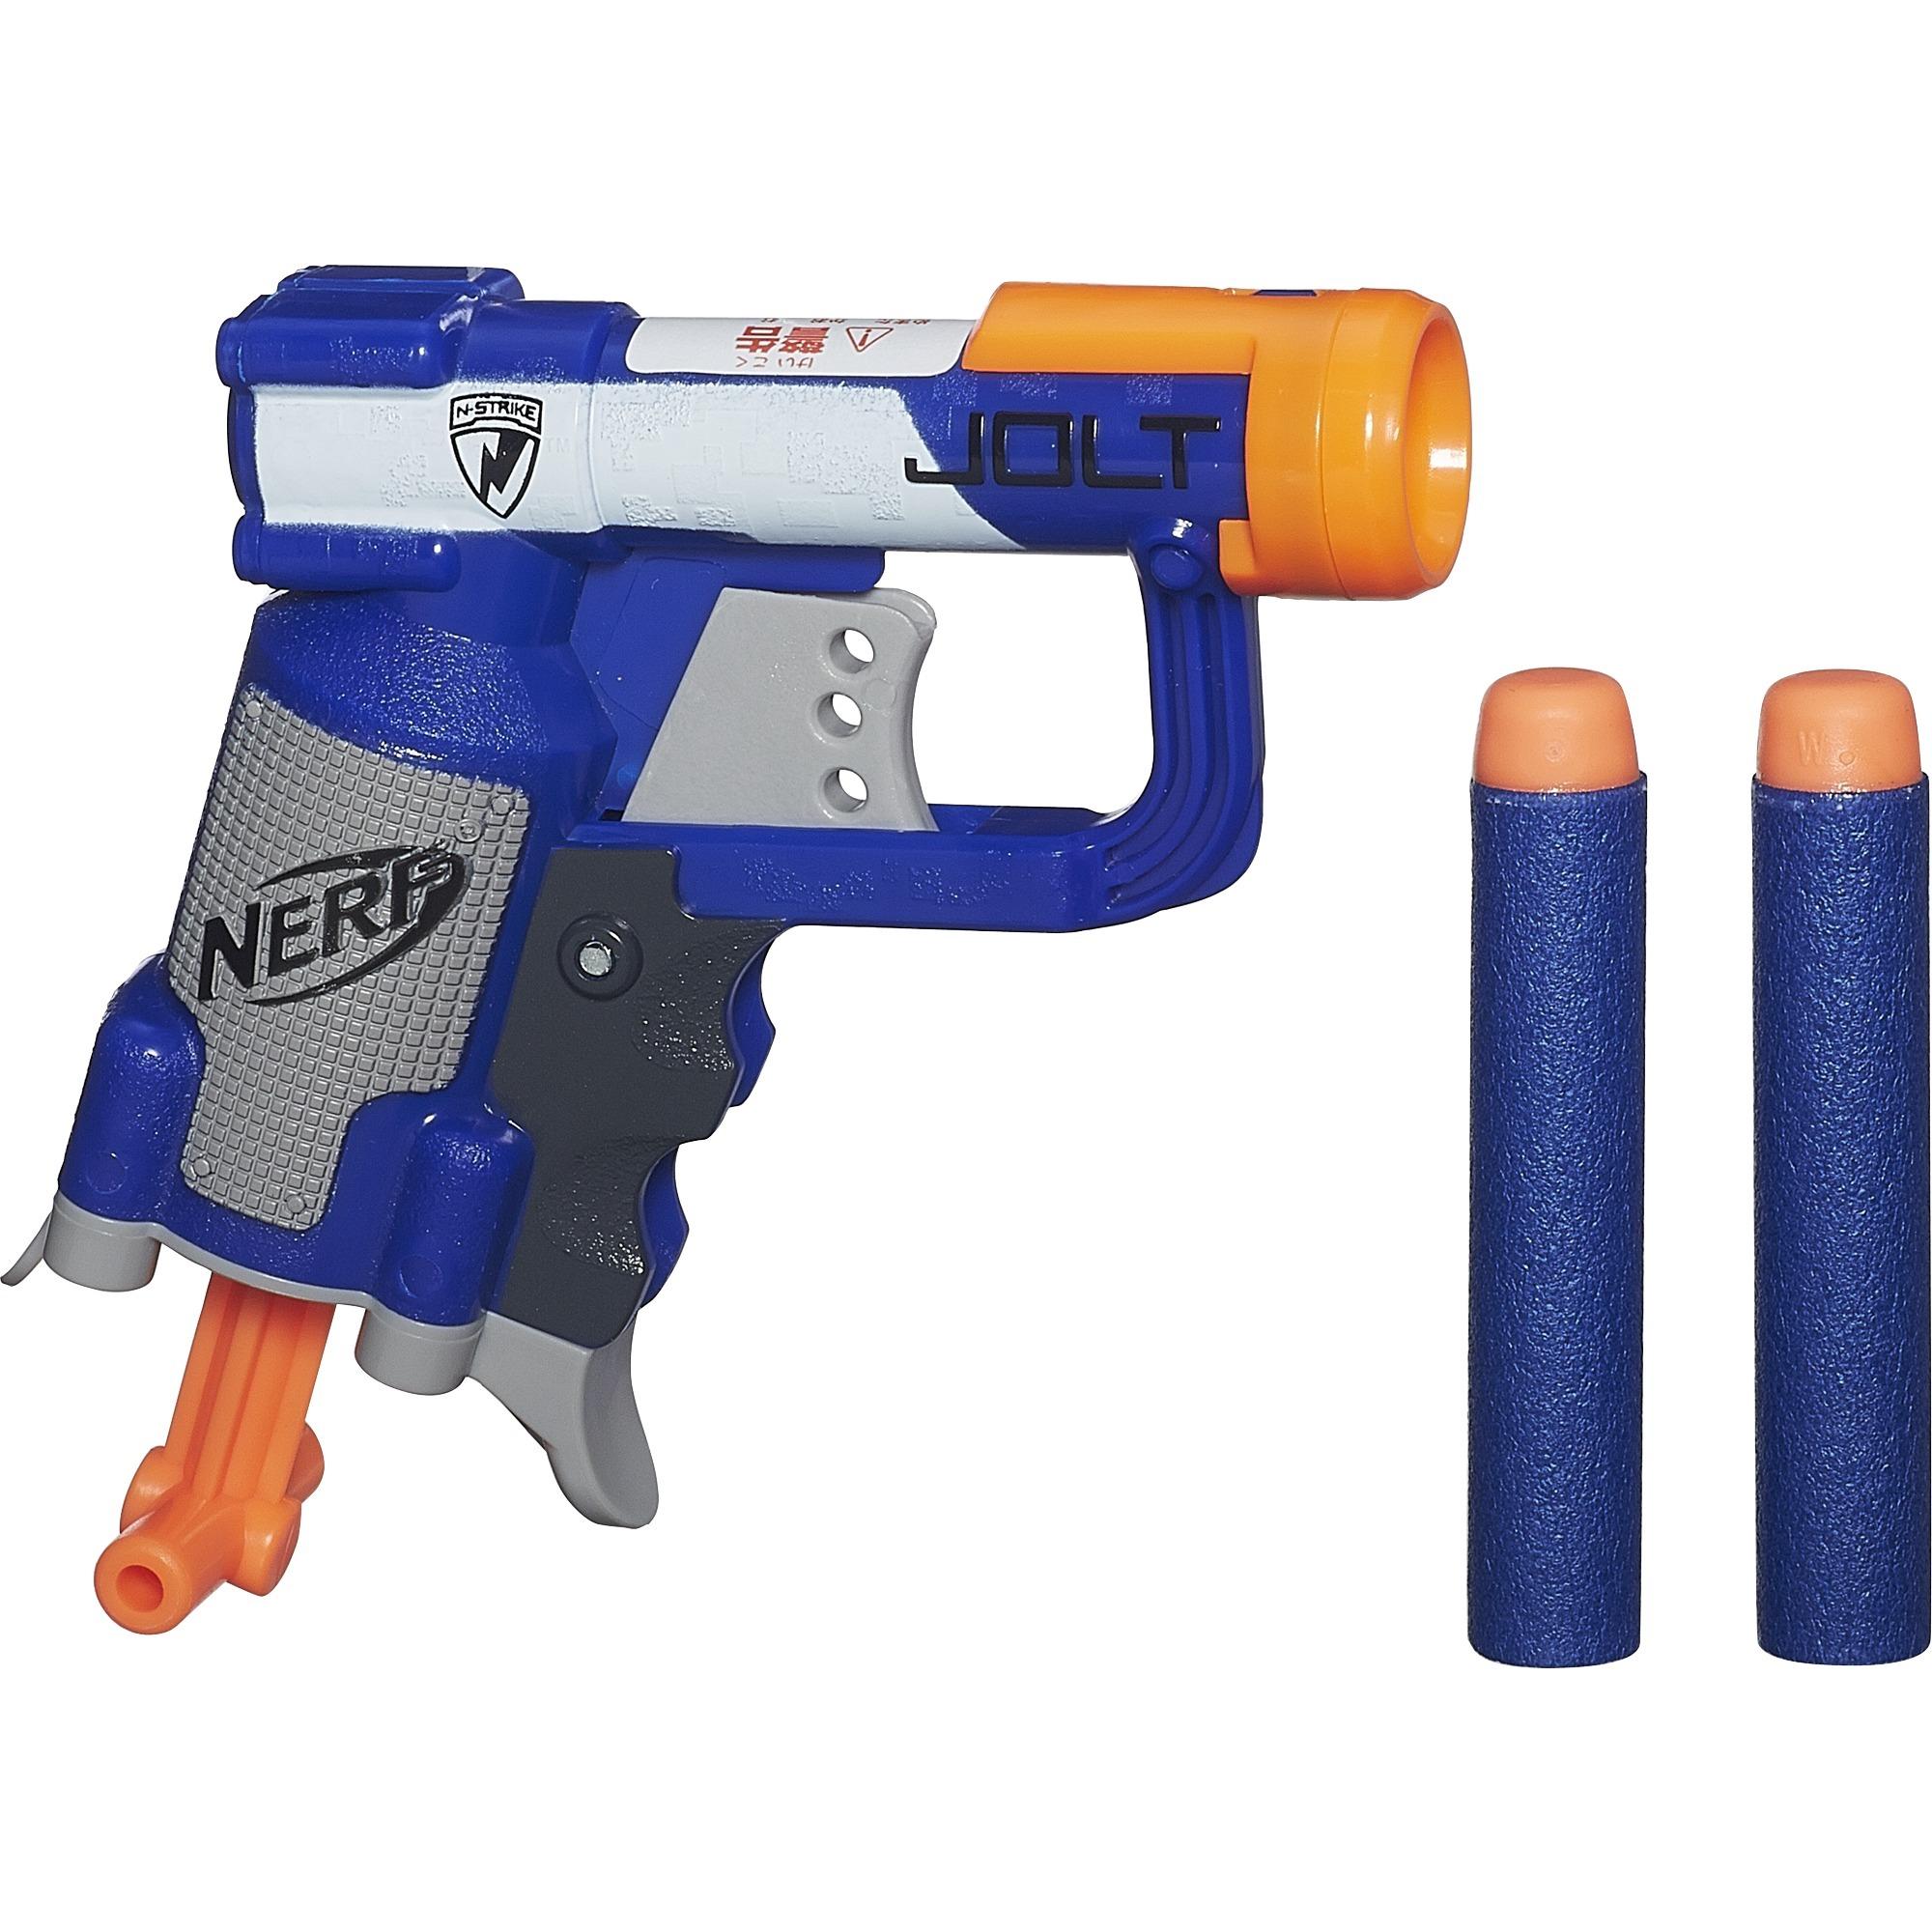 A0707EU6 arma de juguete, Pistola Nerf